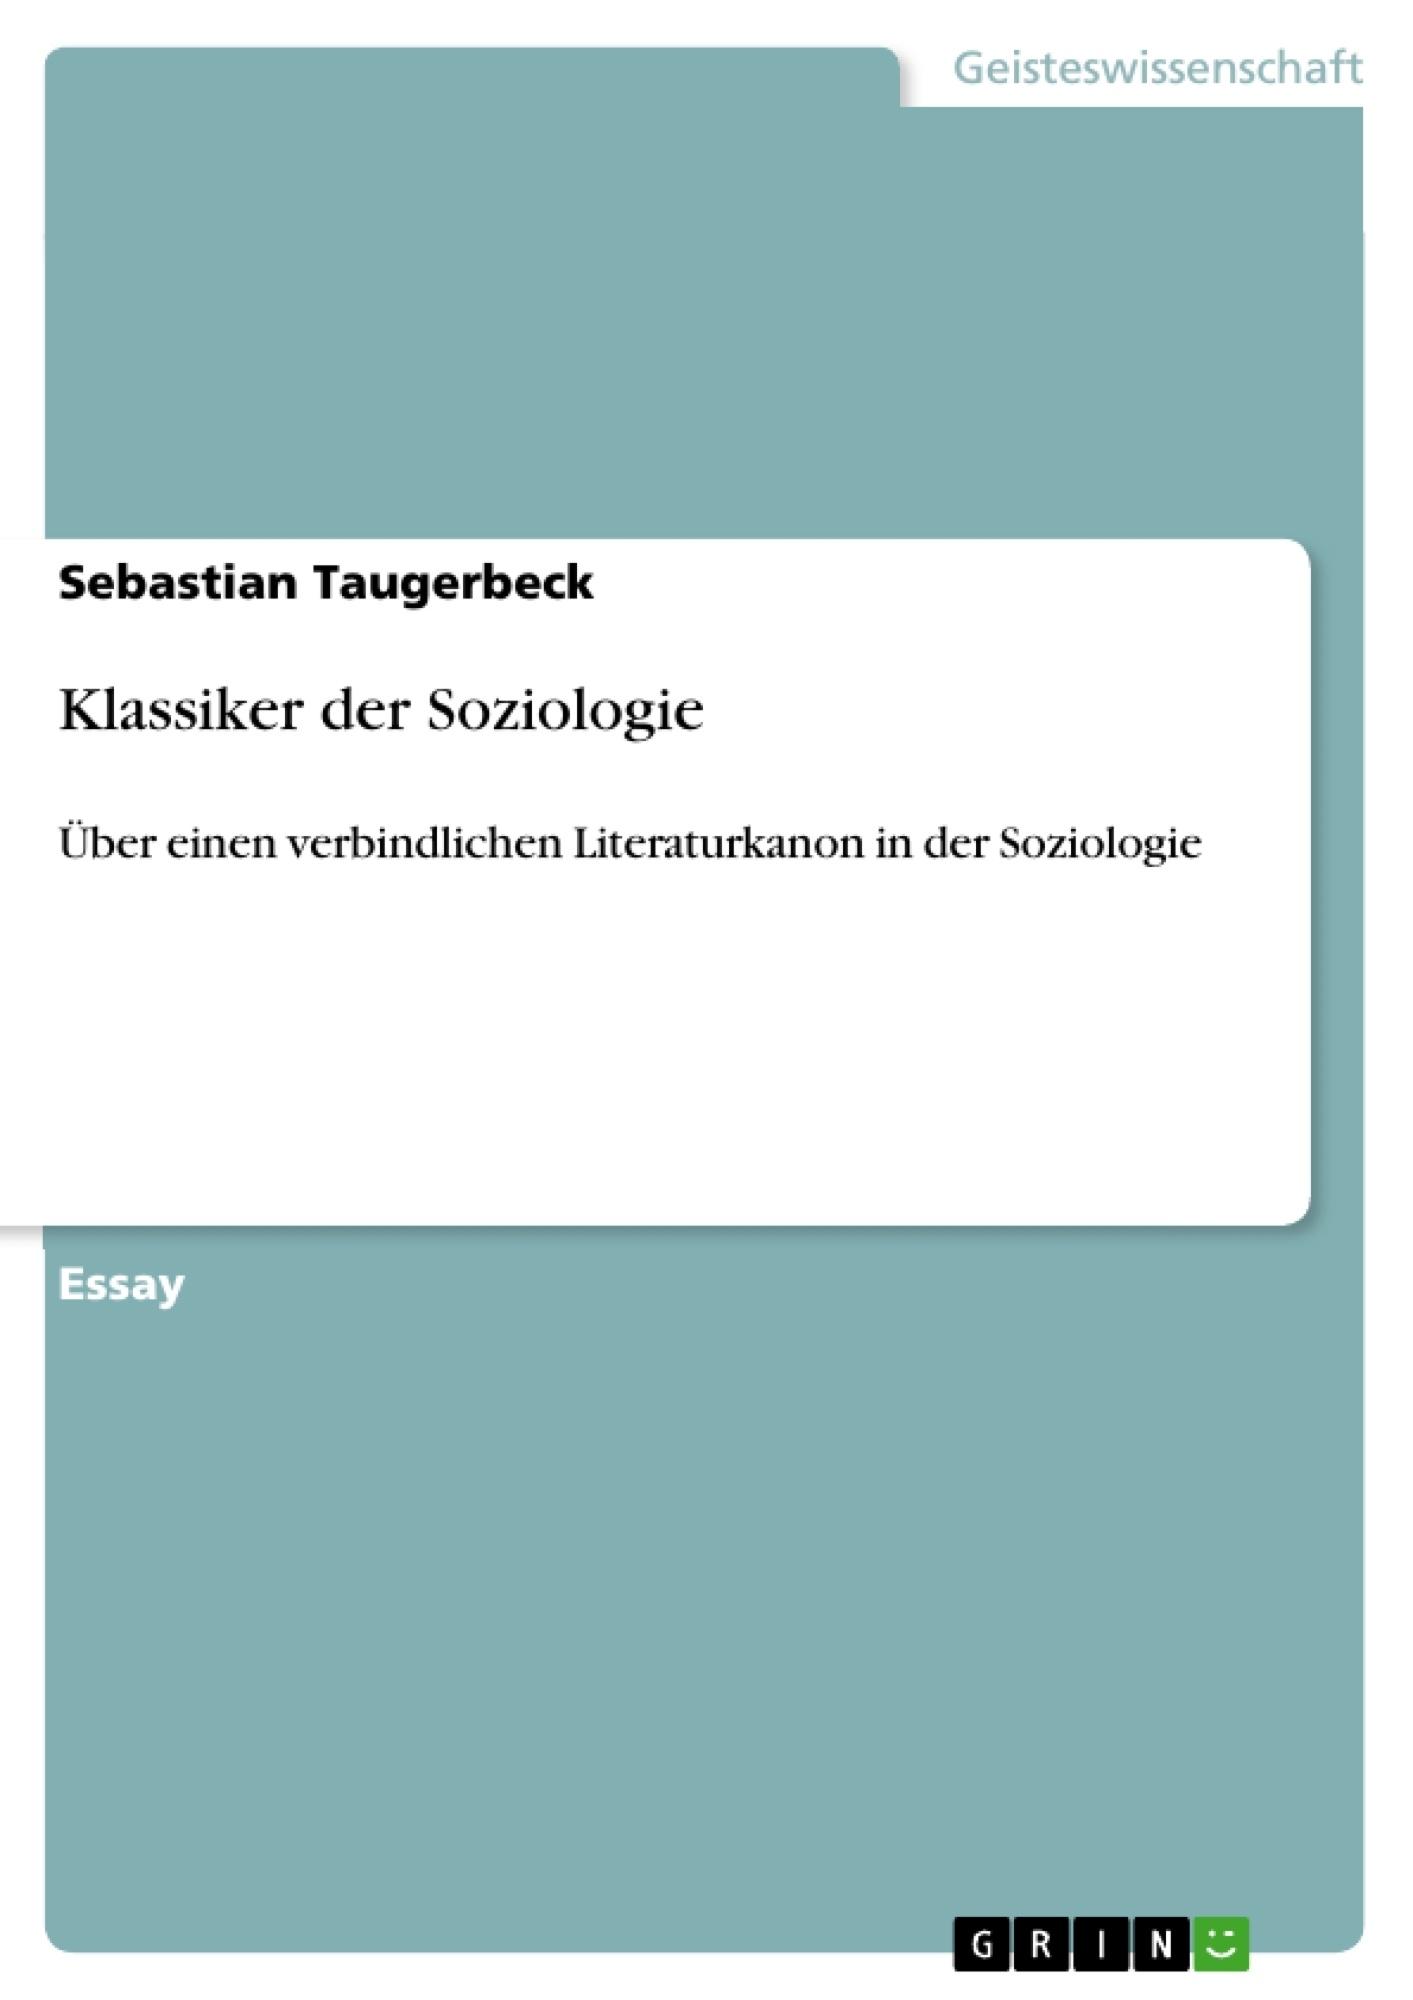 Titel: Klassiker der Soziologie